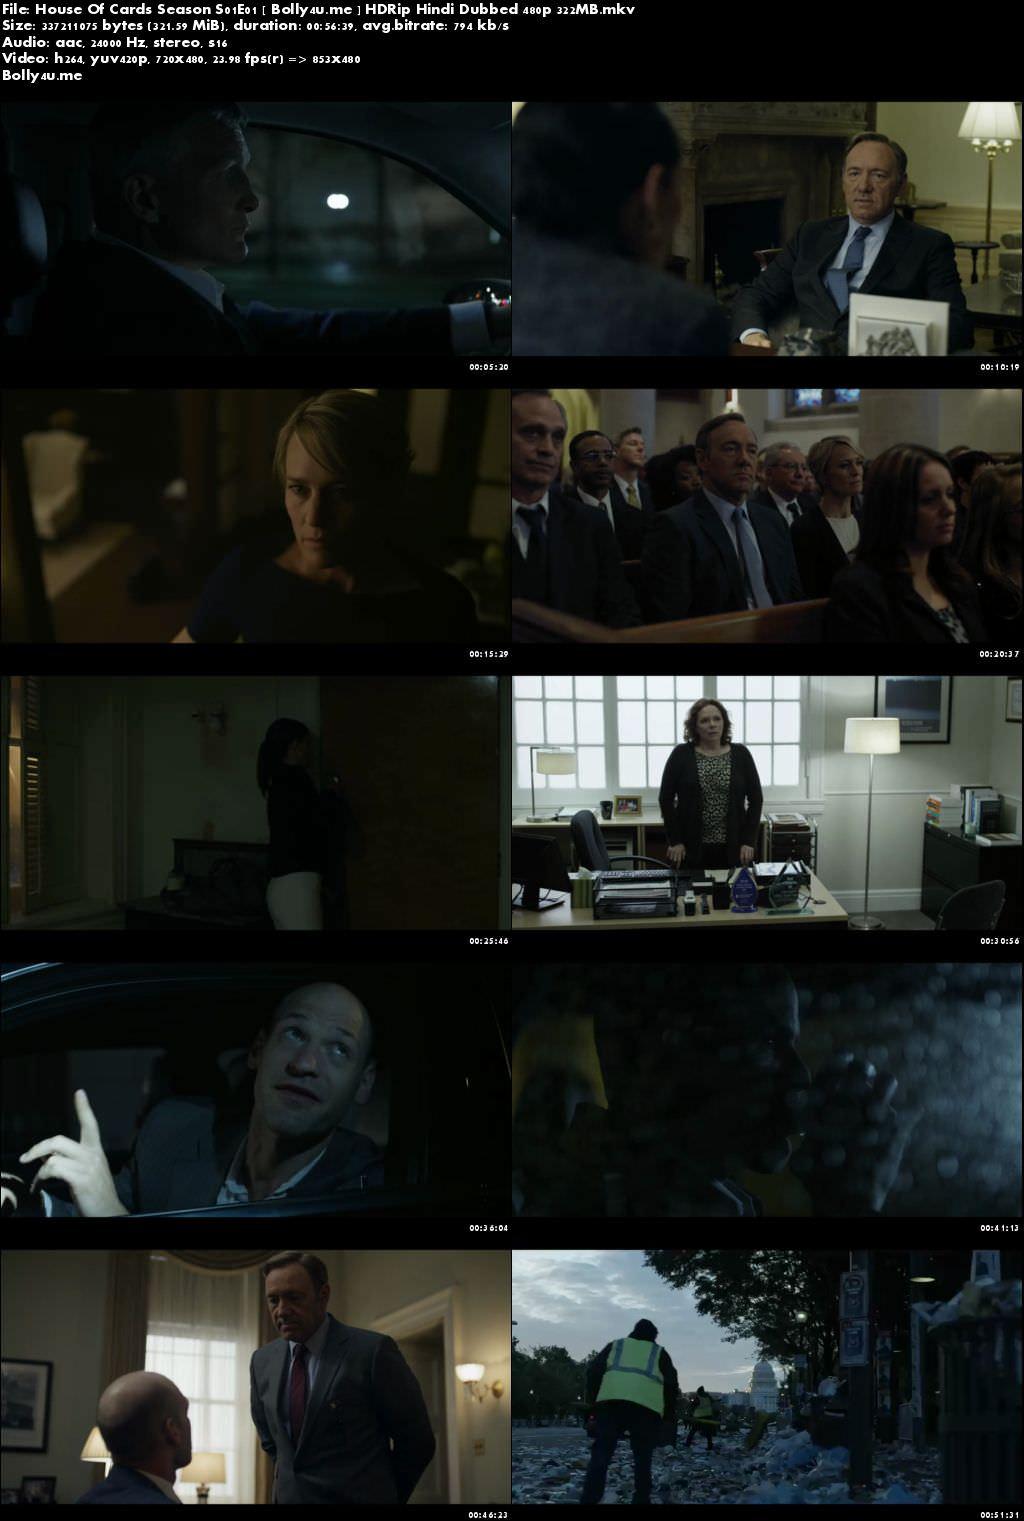 House Of Cards Season S01E01 HDRip 300MB Hindi Dubbed 480p Download